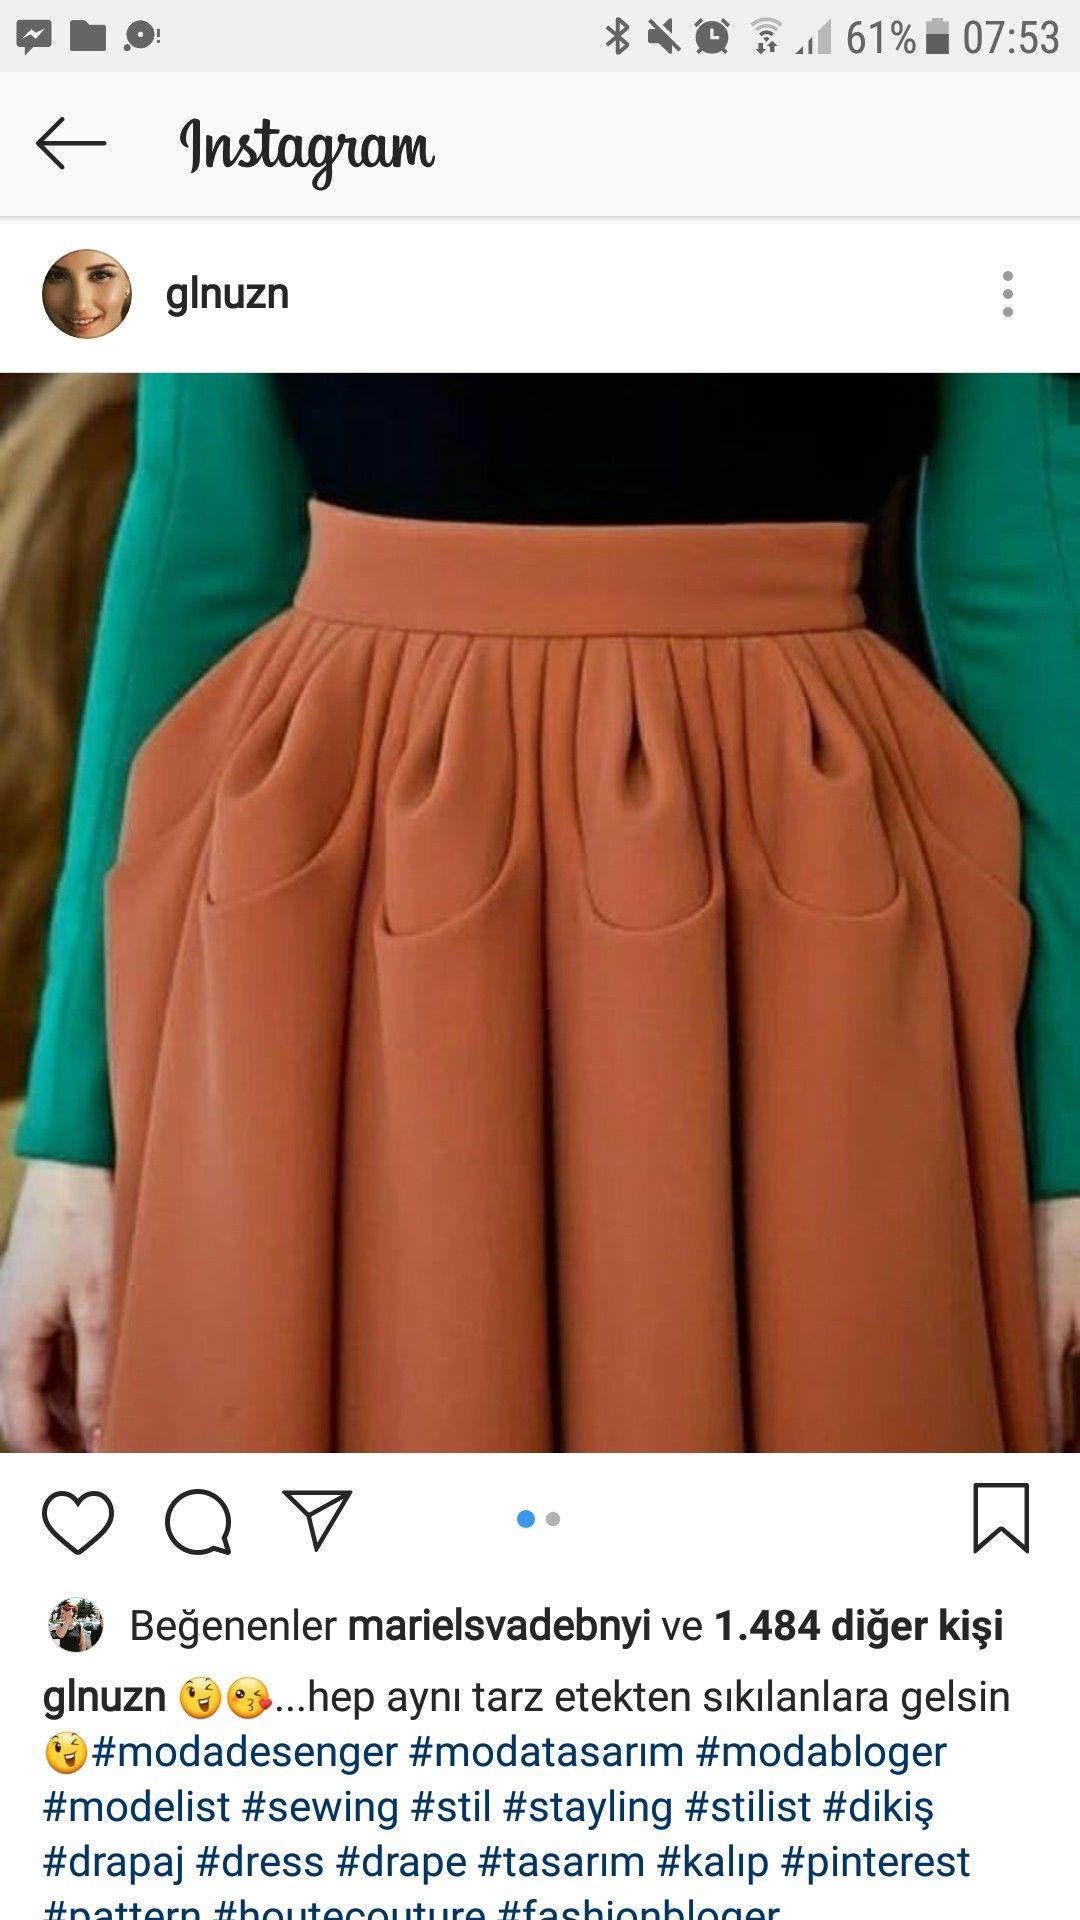 Pin By Lala M Va On A Yubka Modelleri Fashion Style Playing Dress Up